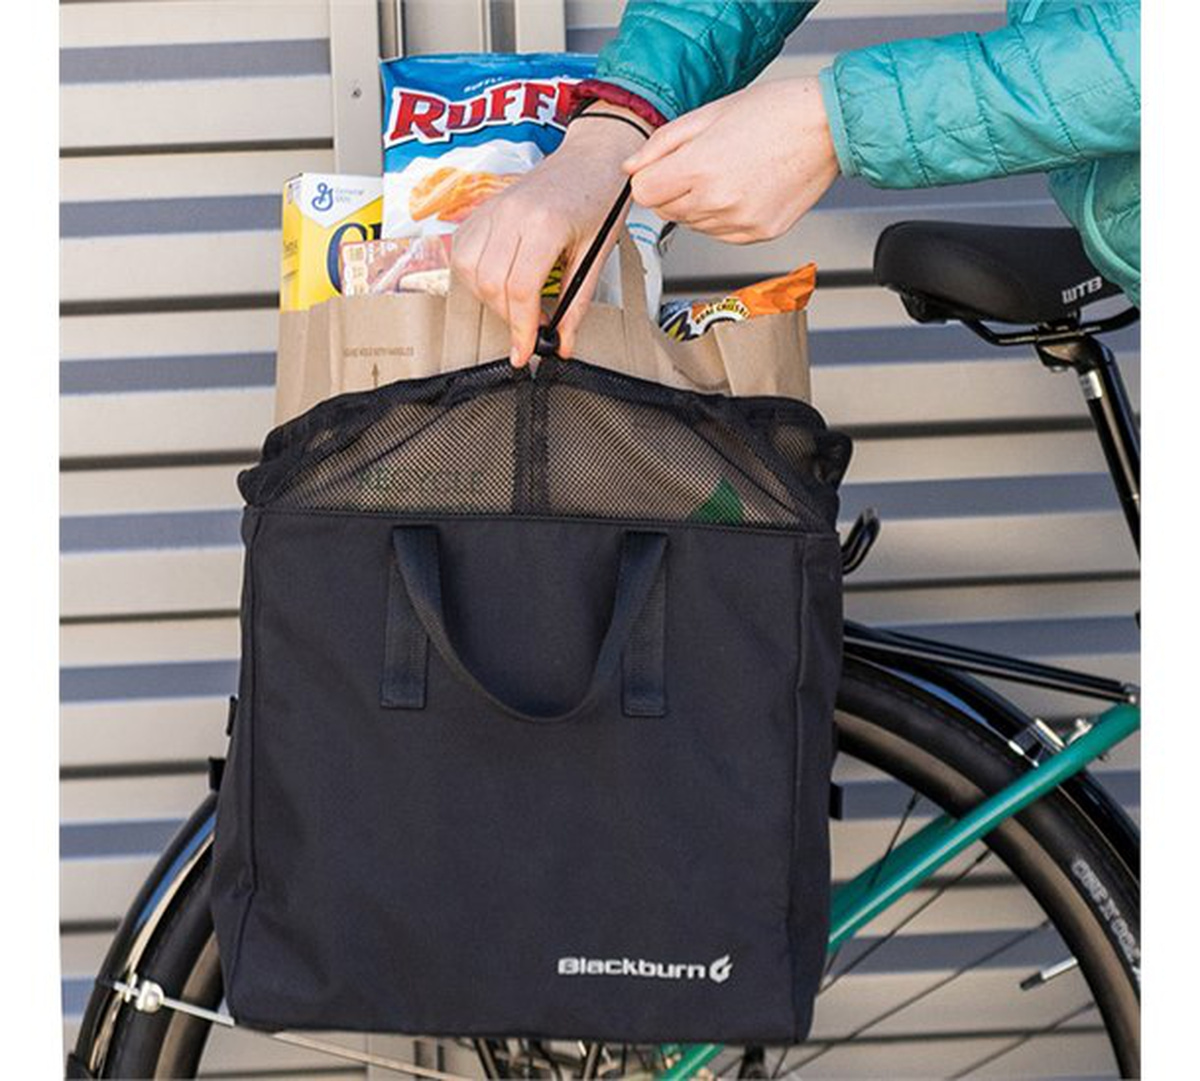 Blackburn Local Grocery Bag